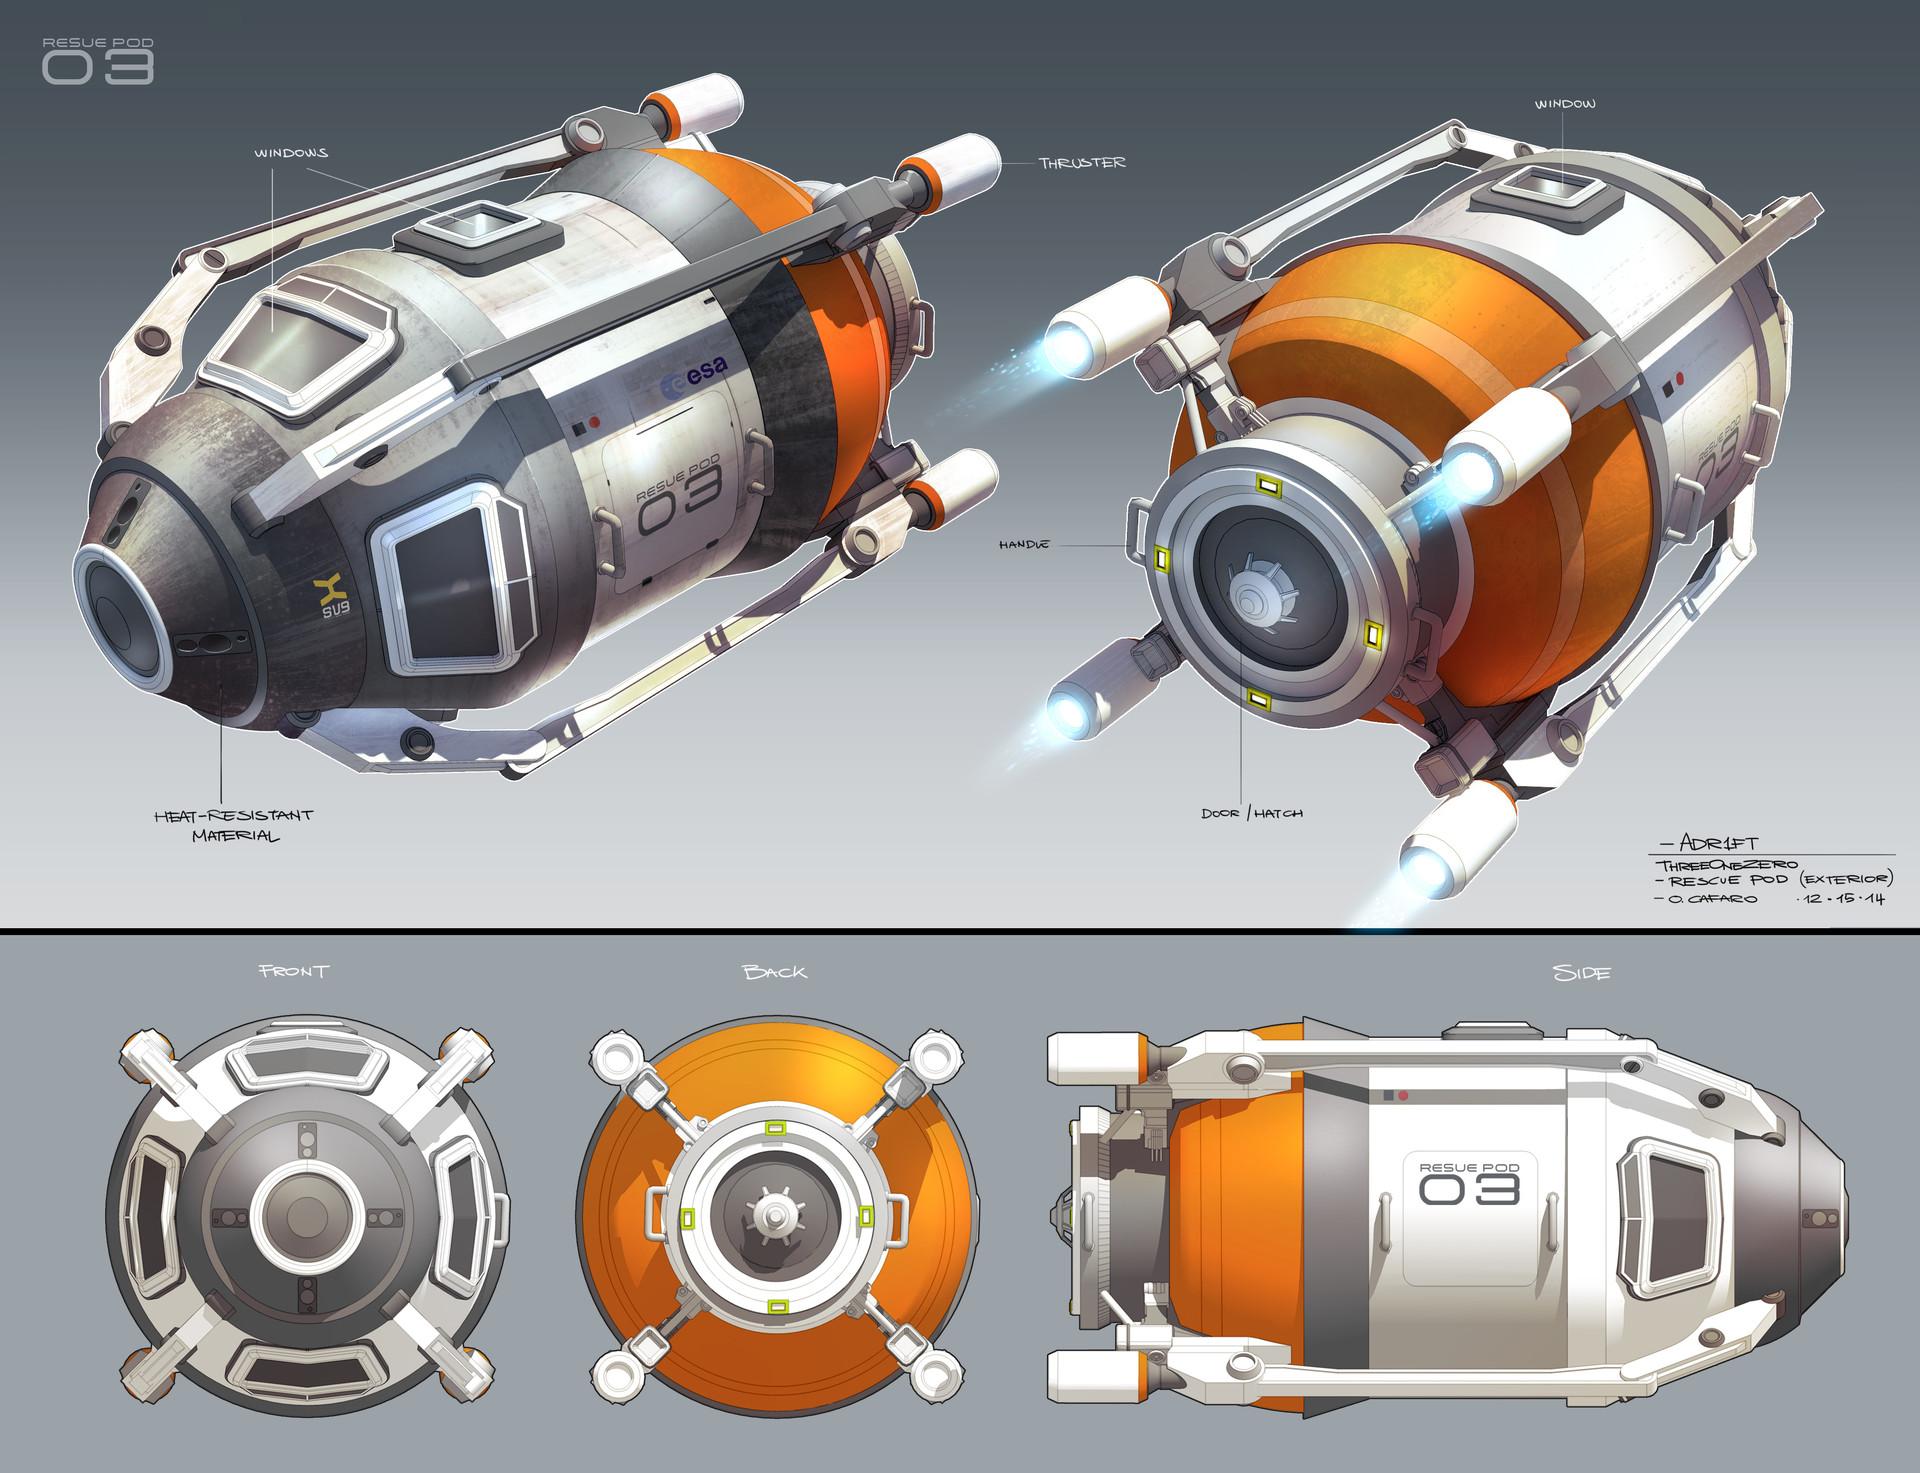 oscar-cafaro-adr1ft-rescue-pod-exterior.jpg